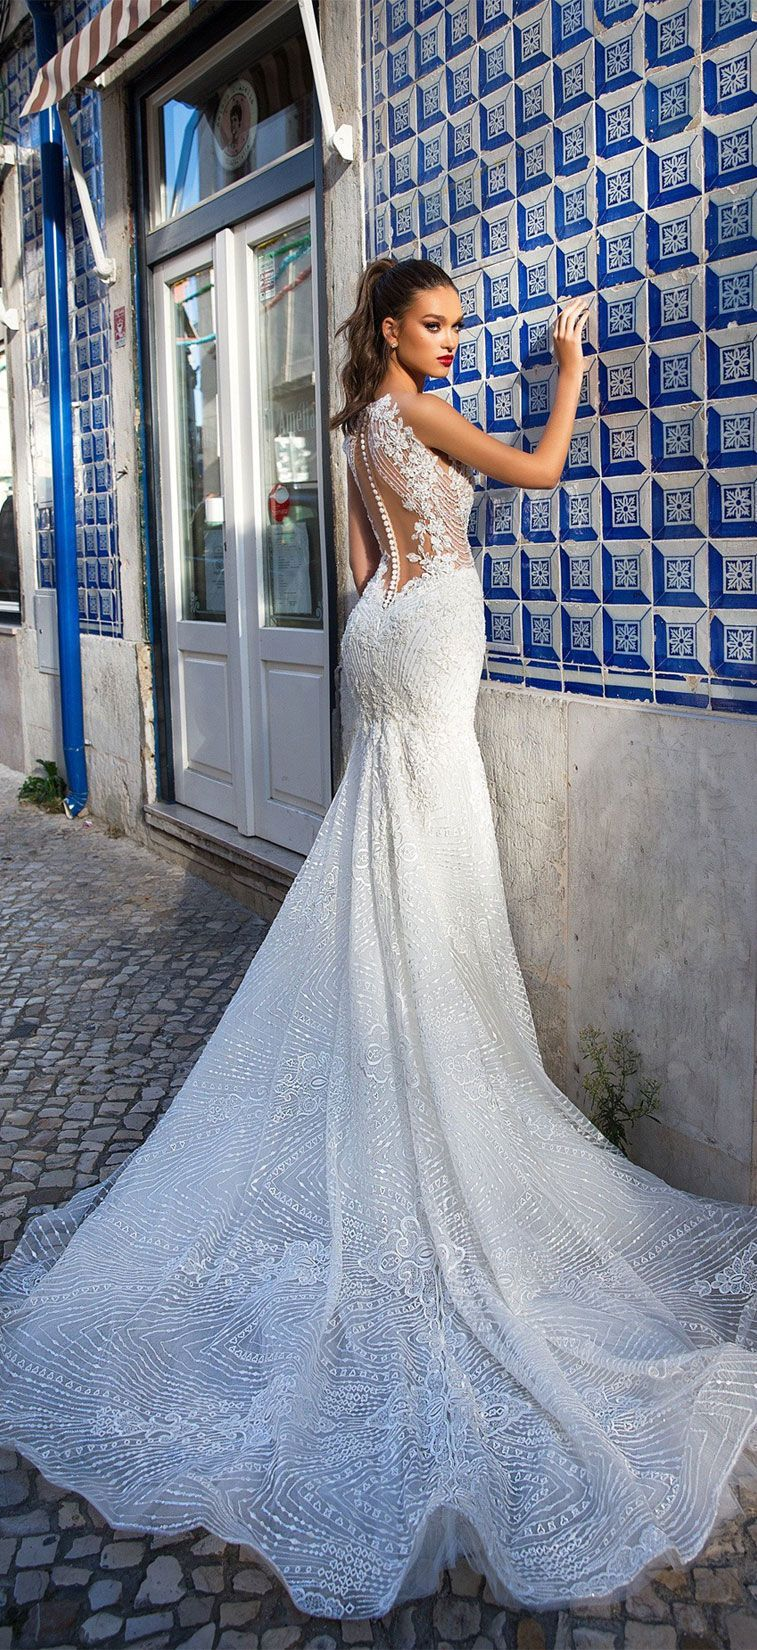 Milla nova wedding dress inspiration dresses pinterest